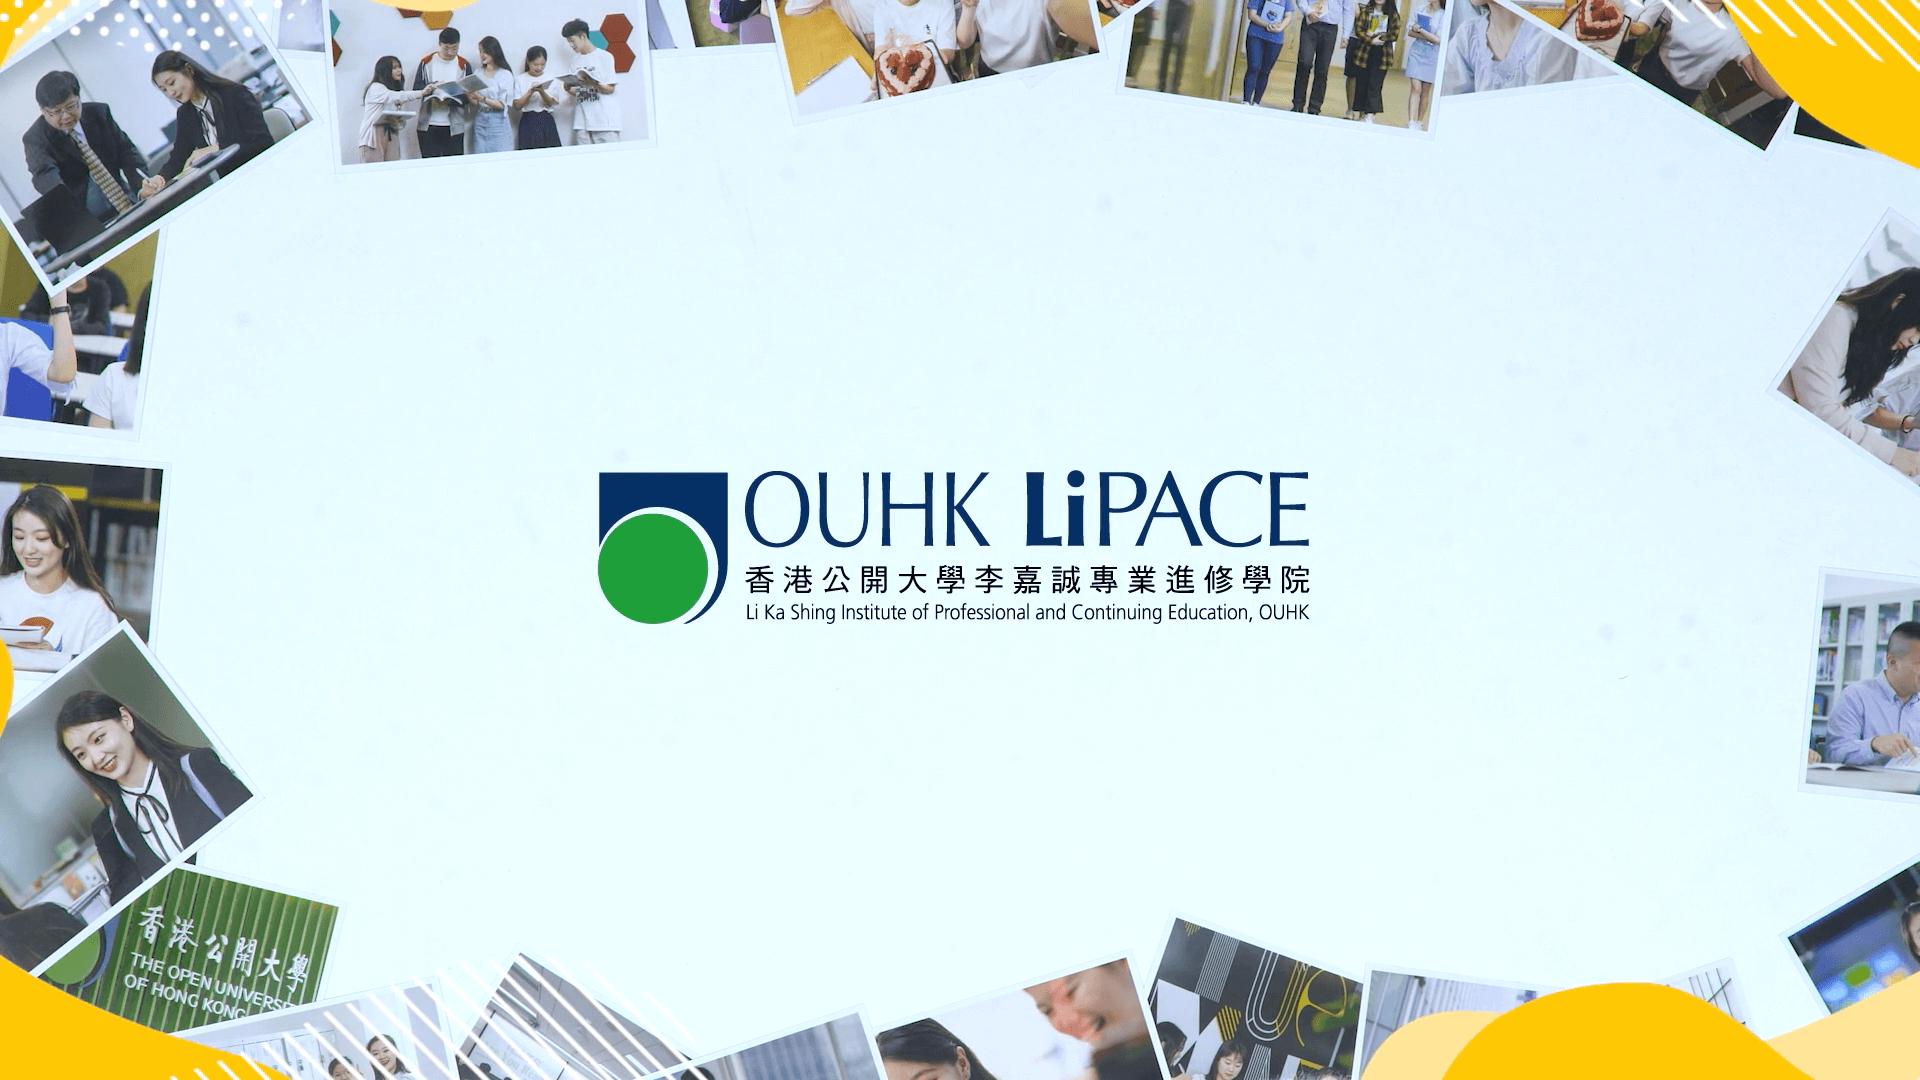 OUHK LiPACE